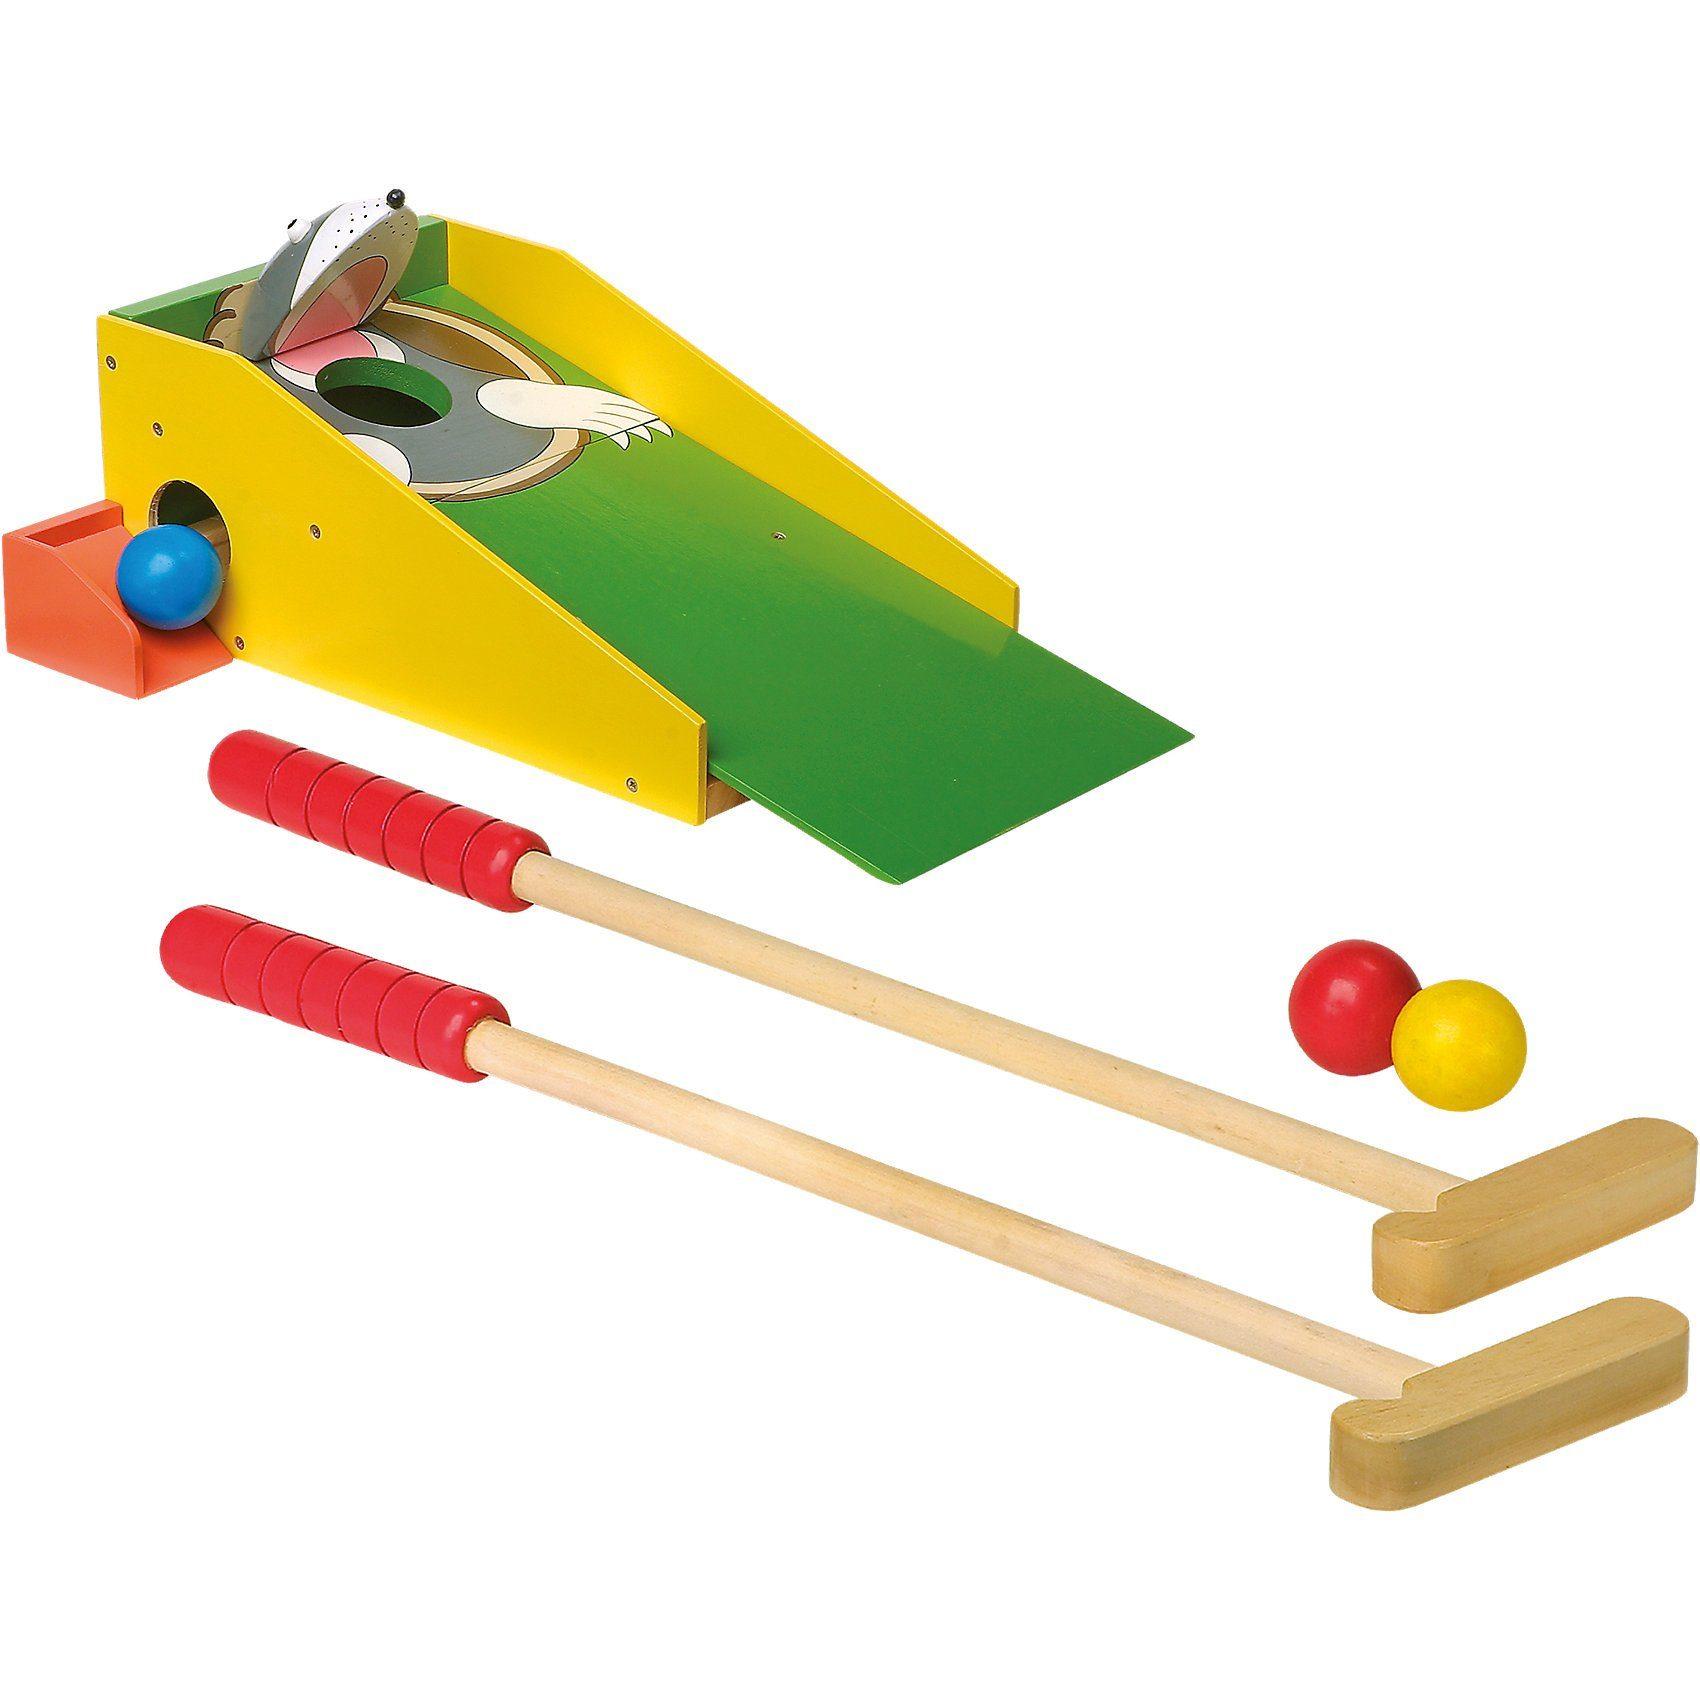 "Minigolf ""Maulwurf"" aus Holz"